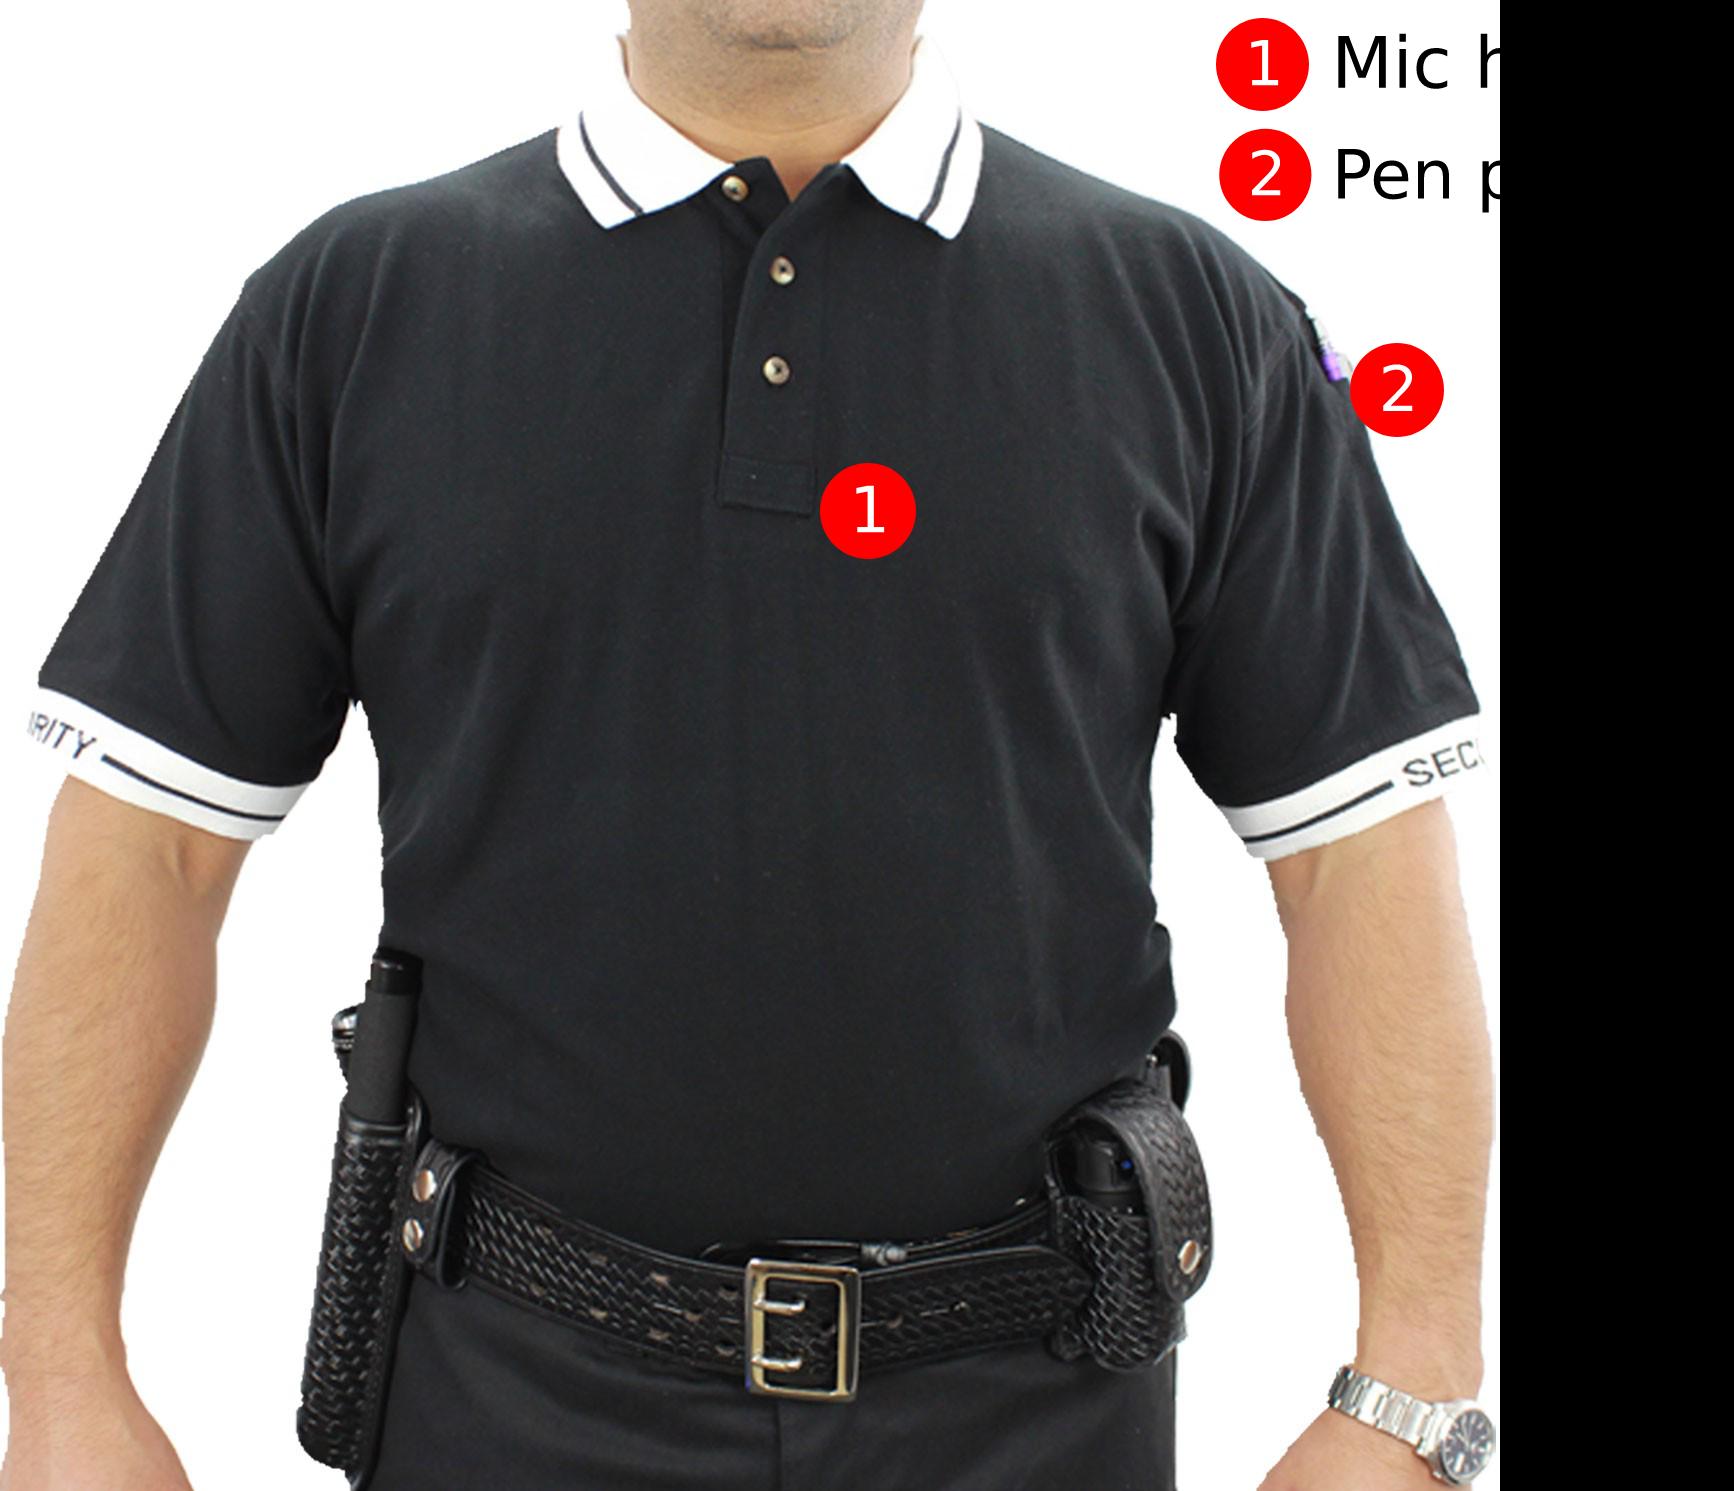 Poly Cotton S/S Security Polo Shirt-